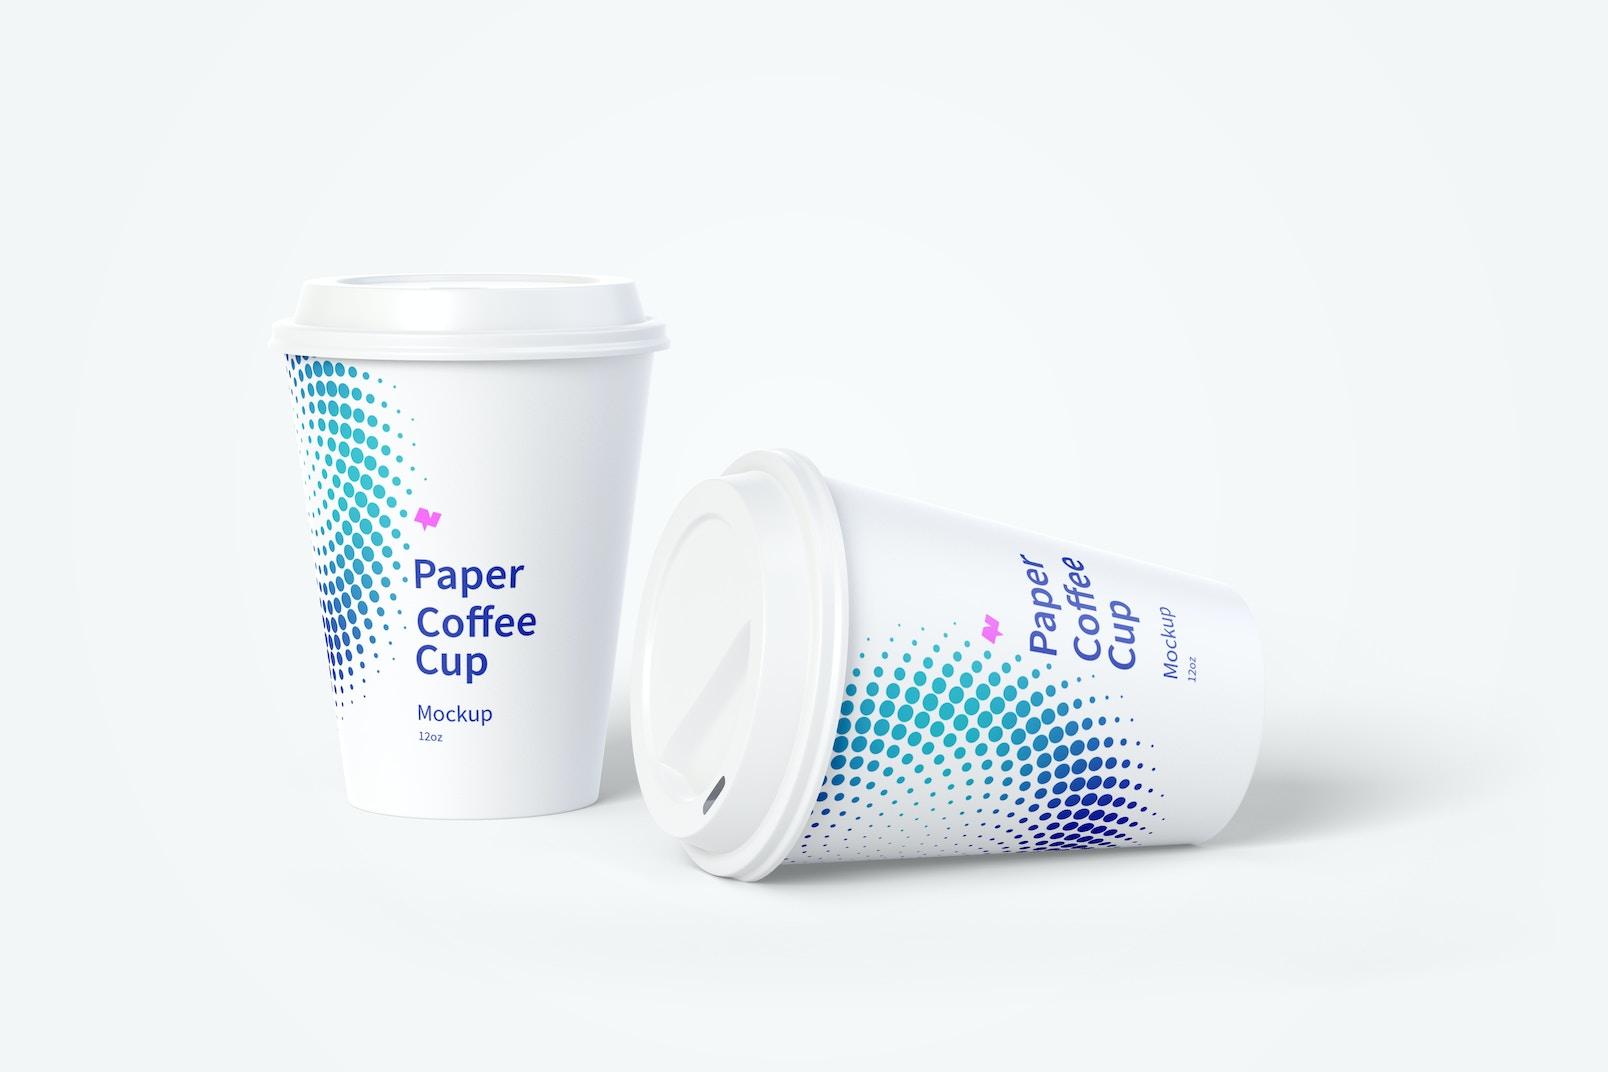 12oz Paper Coffee Cups Mockup 02